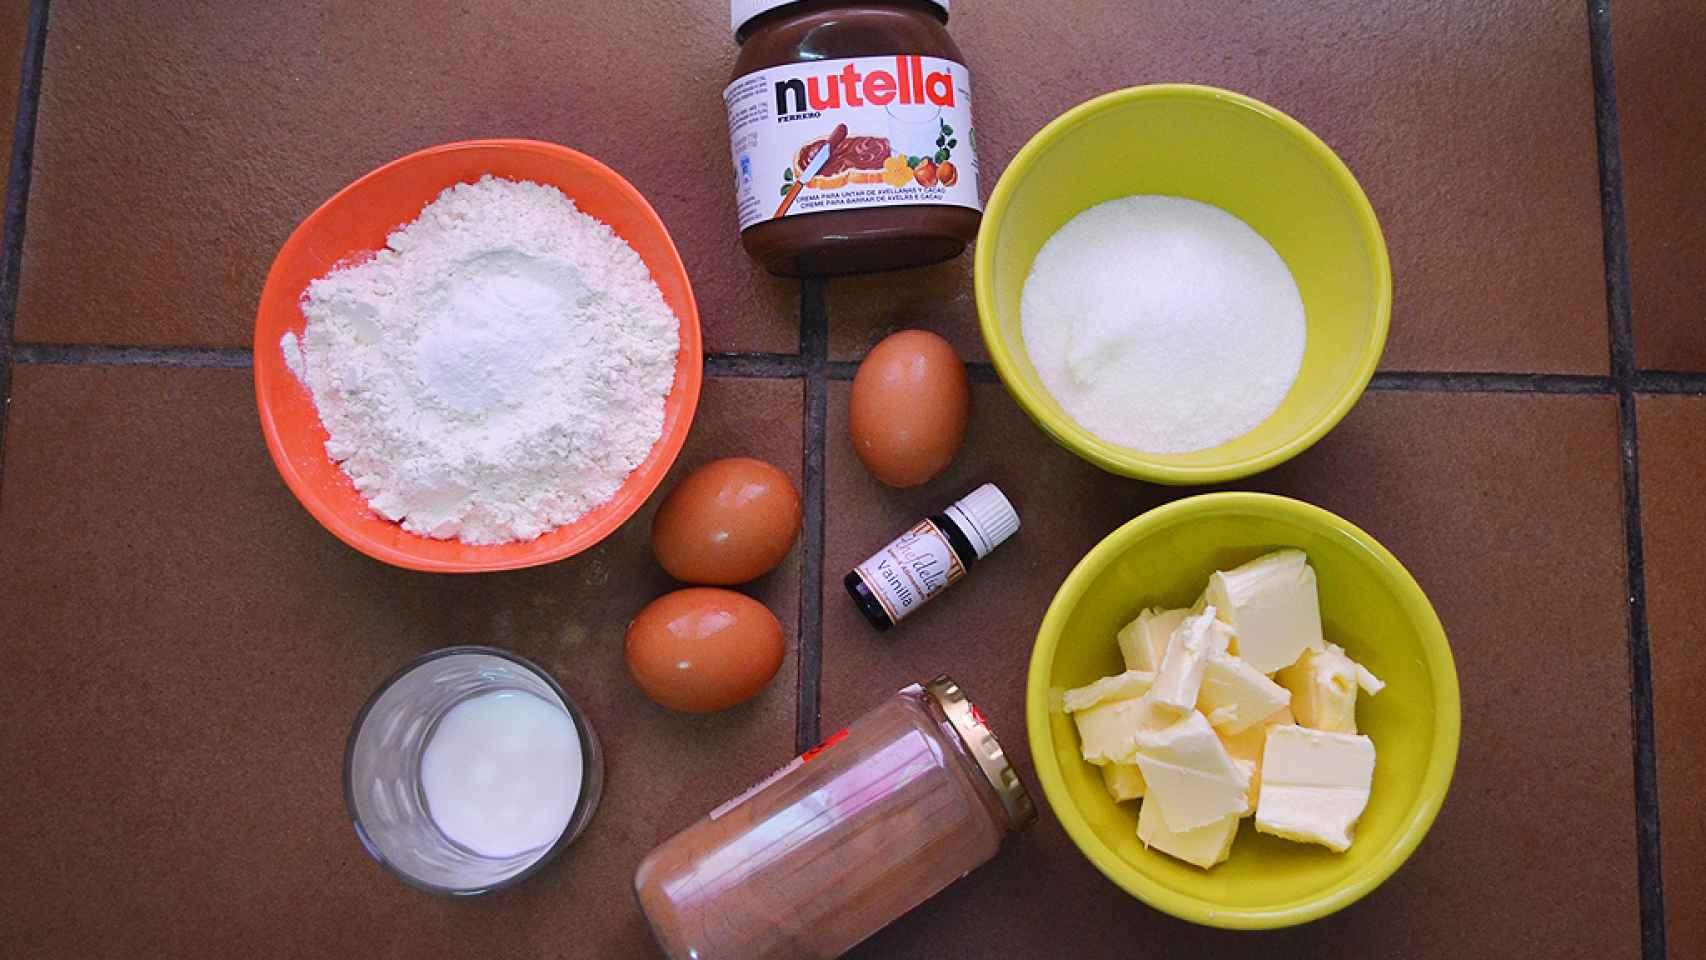 cupcake-buttercream-nutella-01